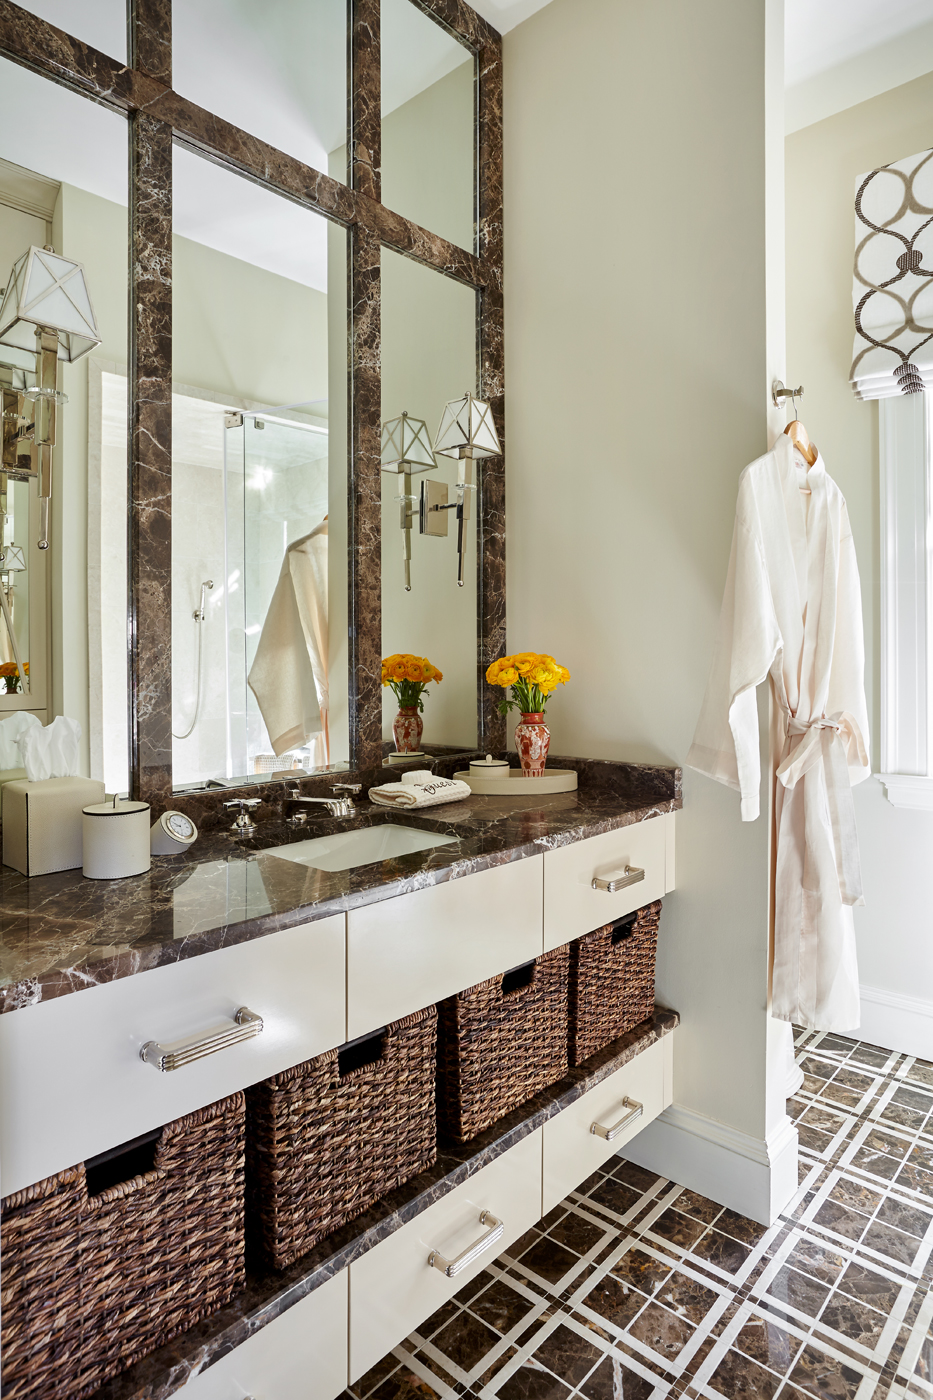 Bathroom vanity with baskets on shelf; Emperador Dark and Crema Marfil marble | Savage Interior Design